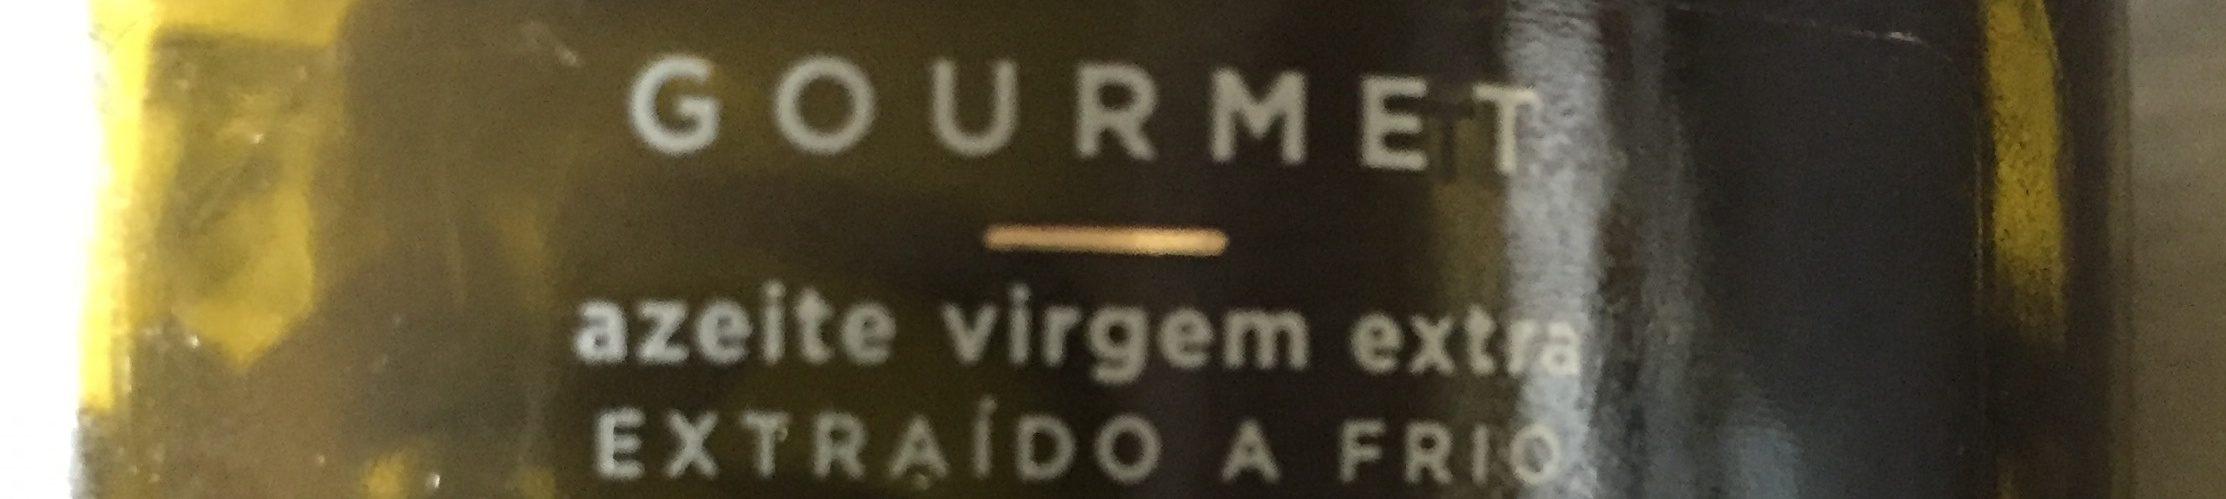 Oliveira da Serra gourmet - Ingrédients - fr